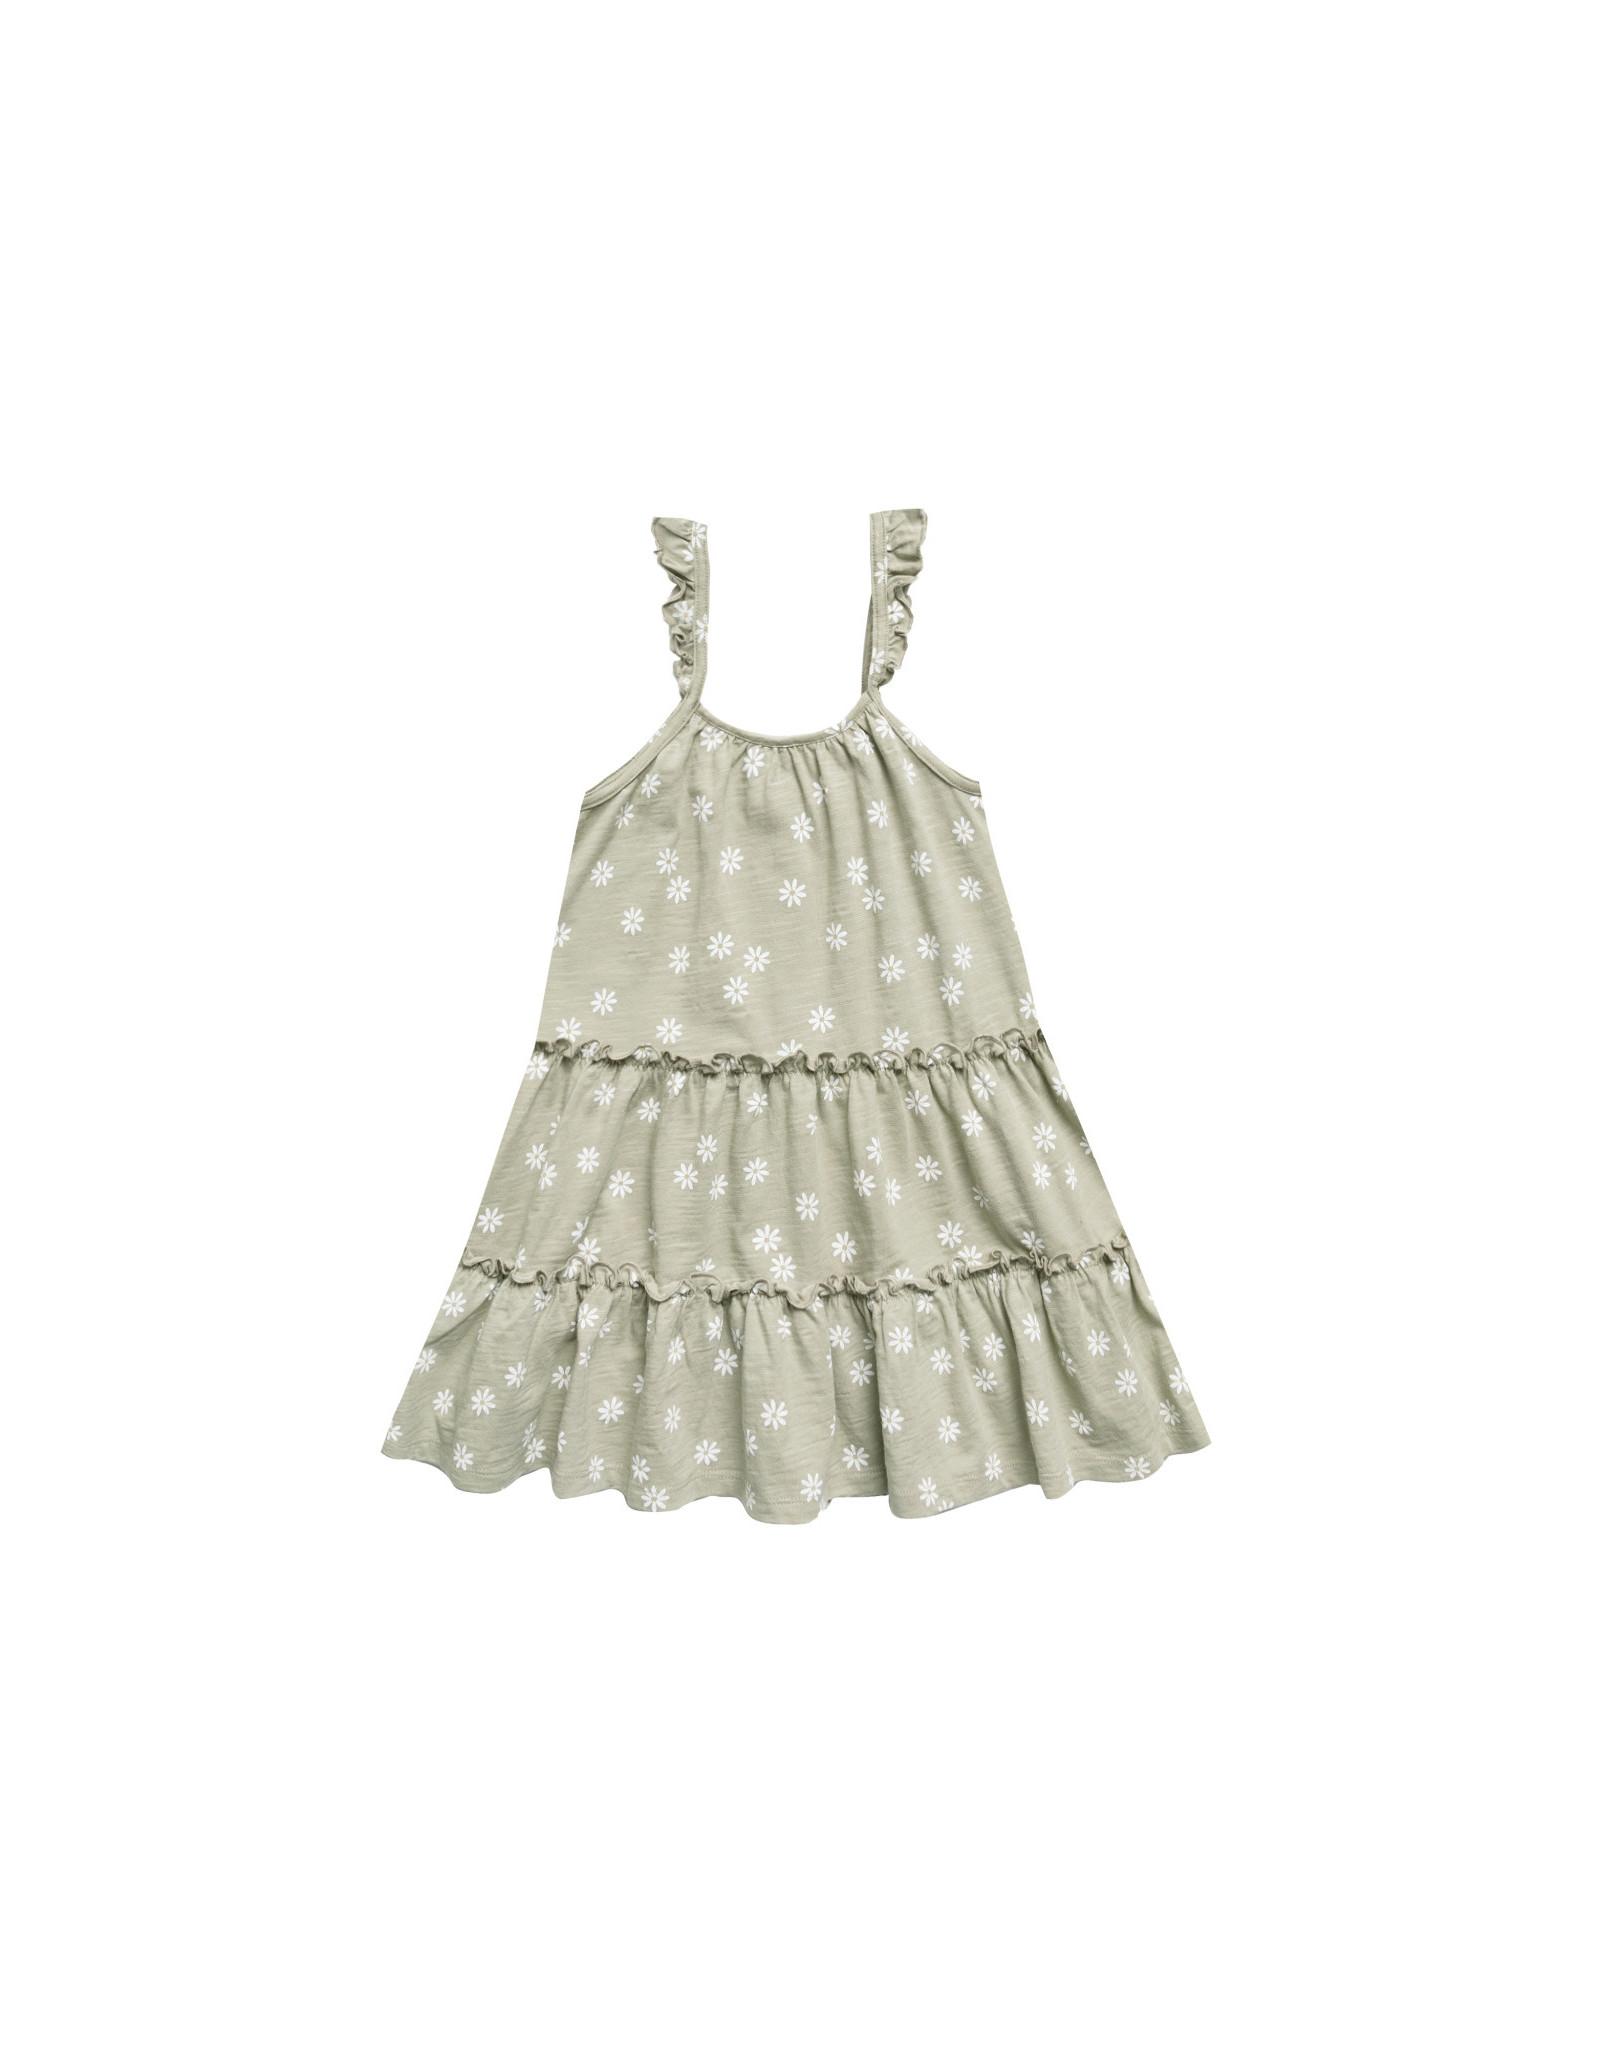 Rylee + Cru Daisy Confetti Tiered Jersey Dress